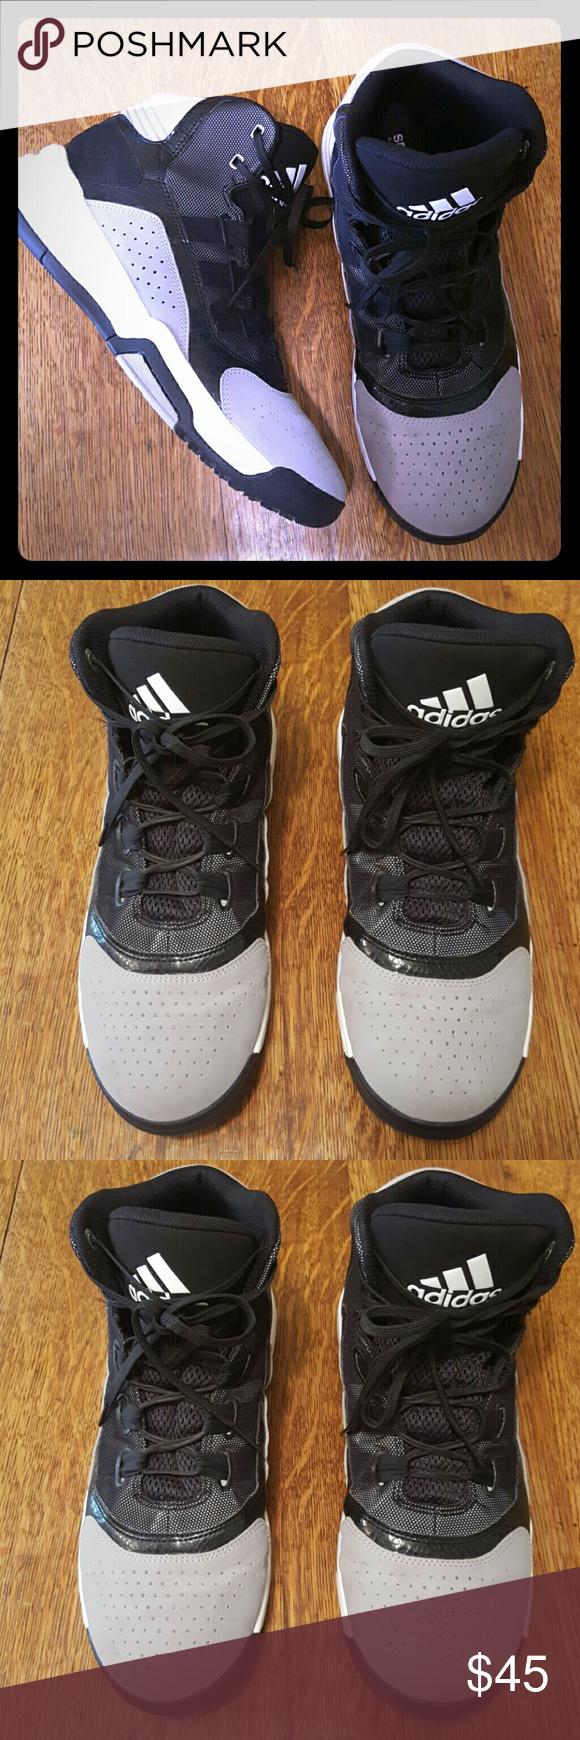 adidas adiprene hightop scarpe, scarpe da ginnastica, le adidas e numero 10